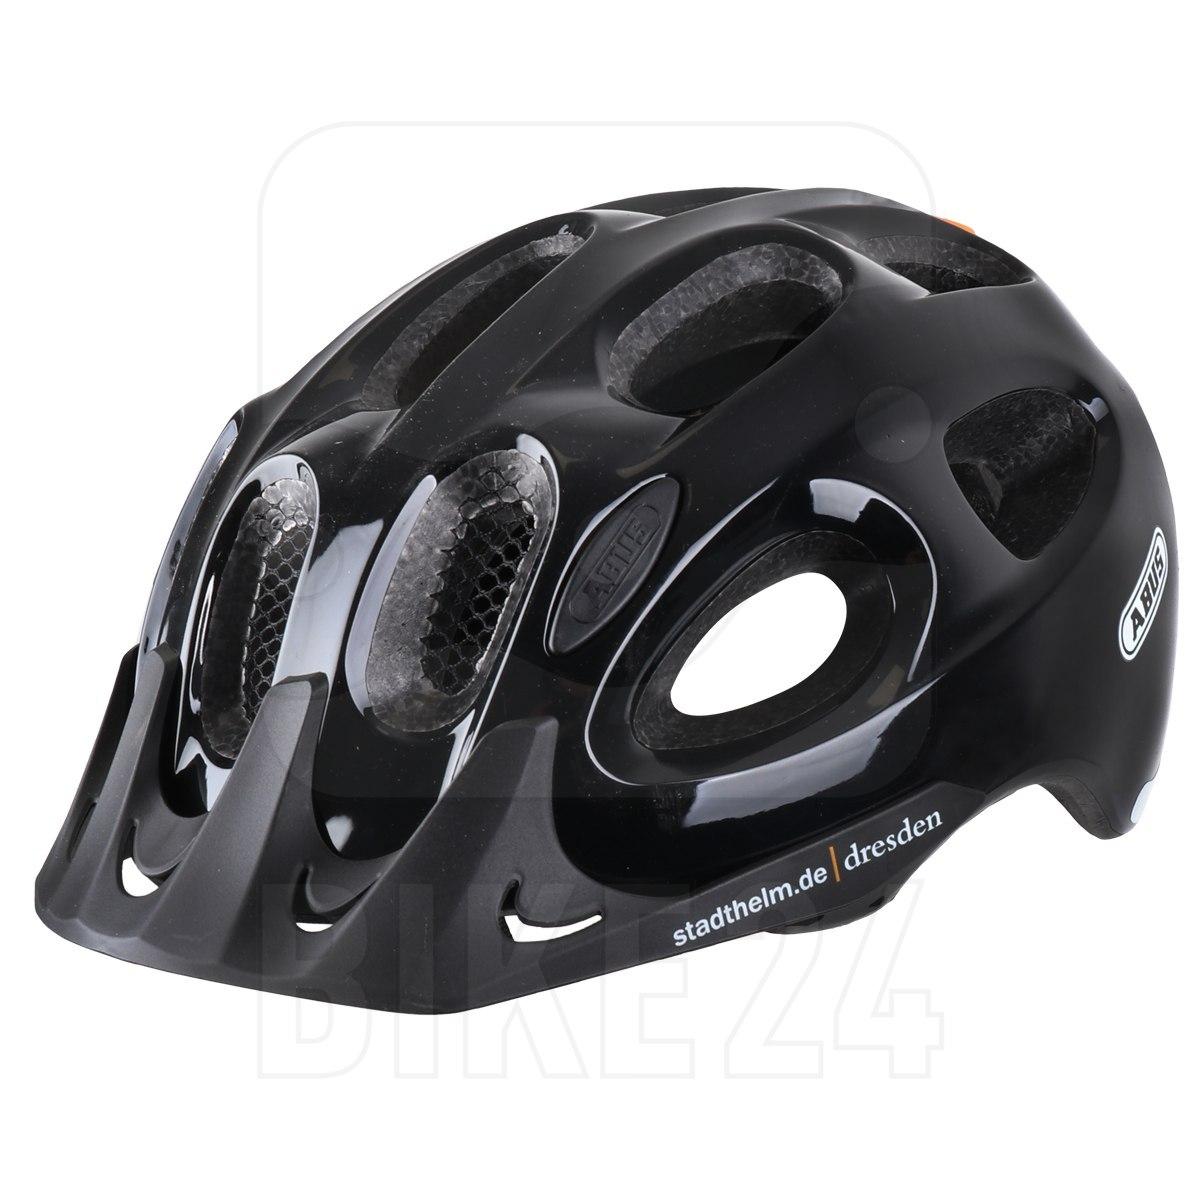 ABUS Stadthelm Youn-I Dresden Helmet - black